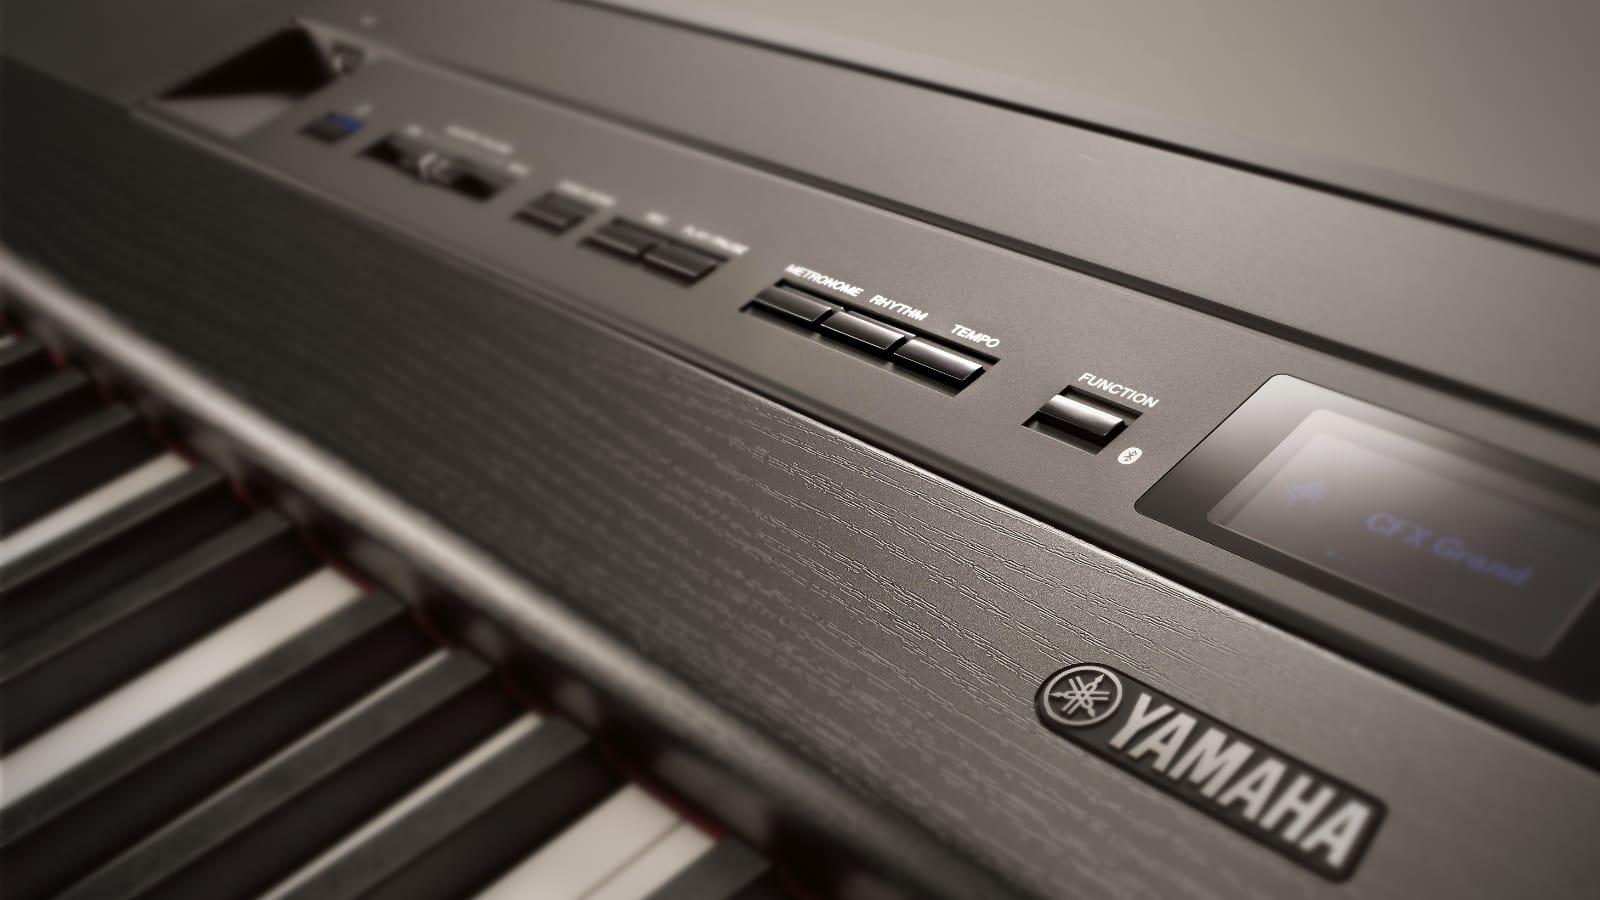 Digitalpiano-Funktionen: E-Piano-Technik verstehen (Bildquelle: Yamaha)